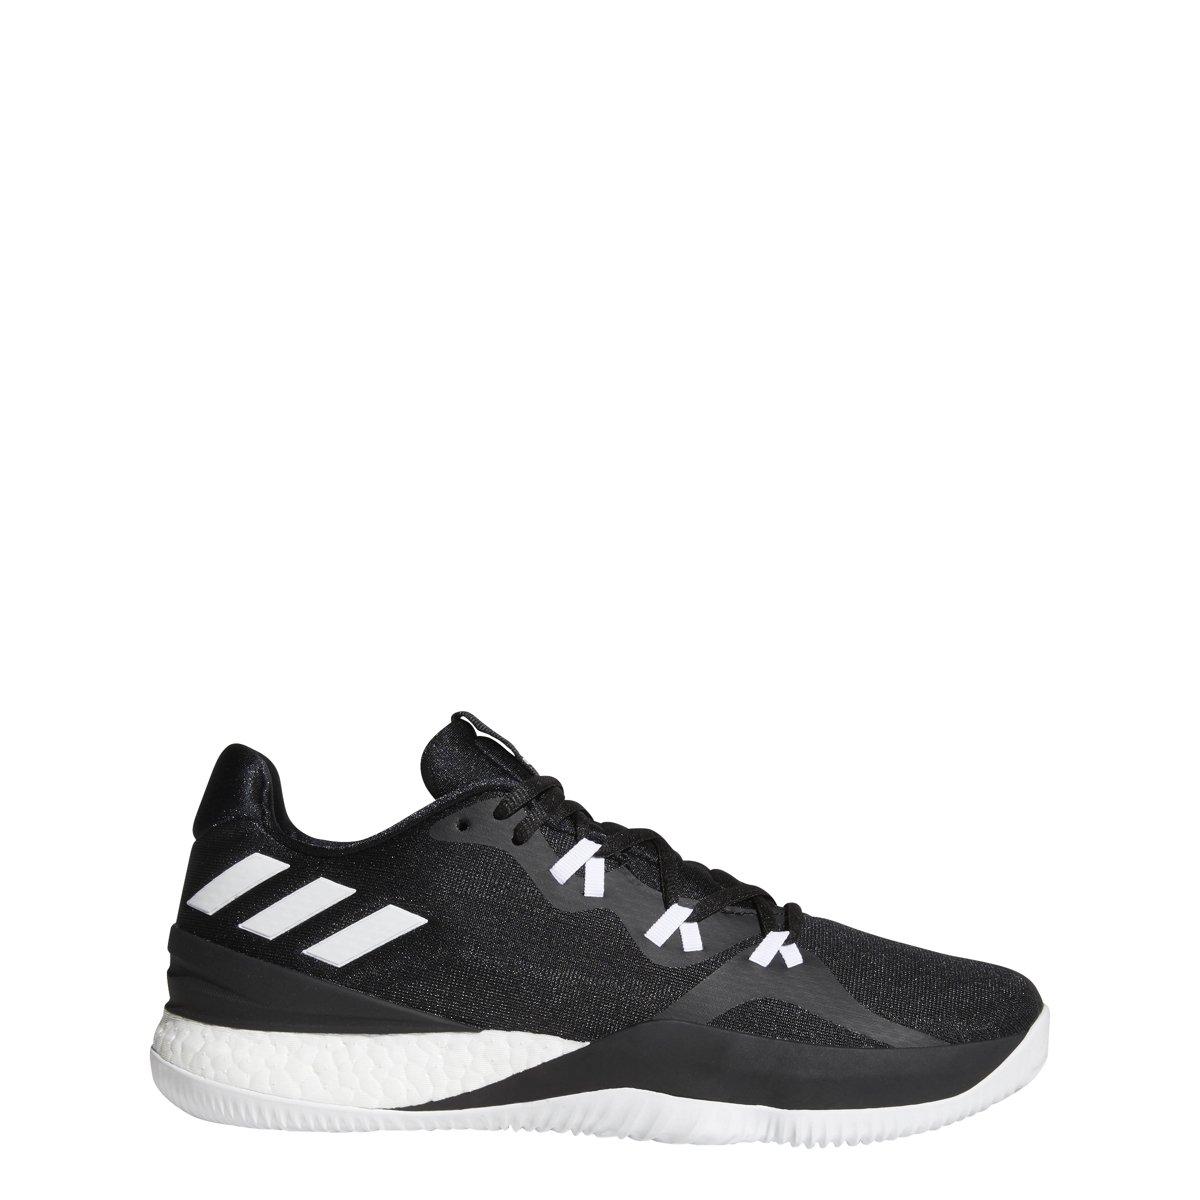 adidas Crazy Light Boost 2018 Shoe Men's Basketball B07BHL6SBS 18 M EU|Core Black-white-carbon